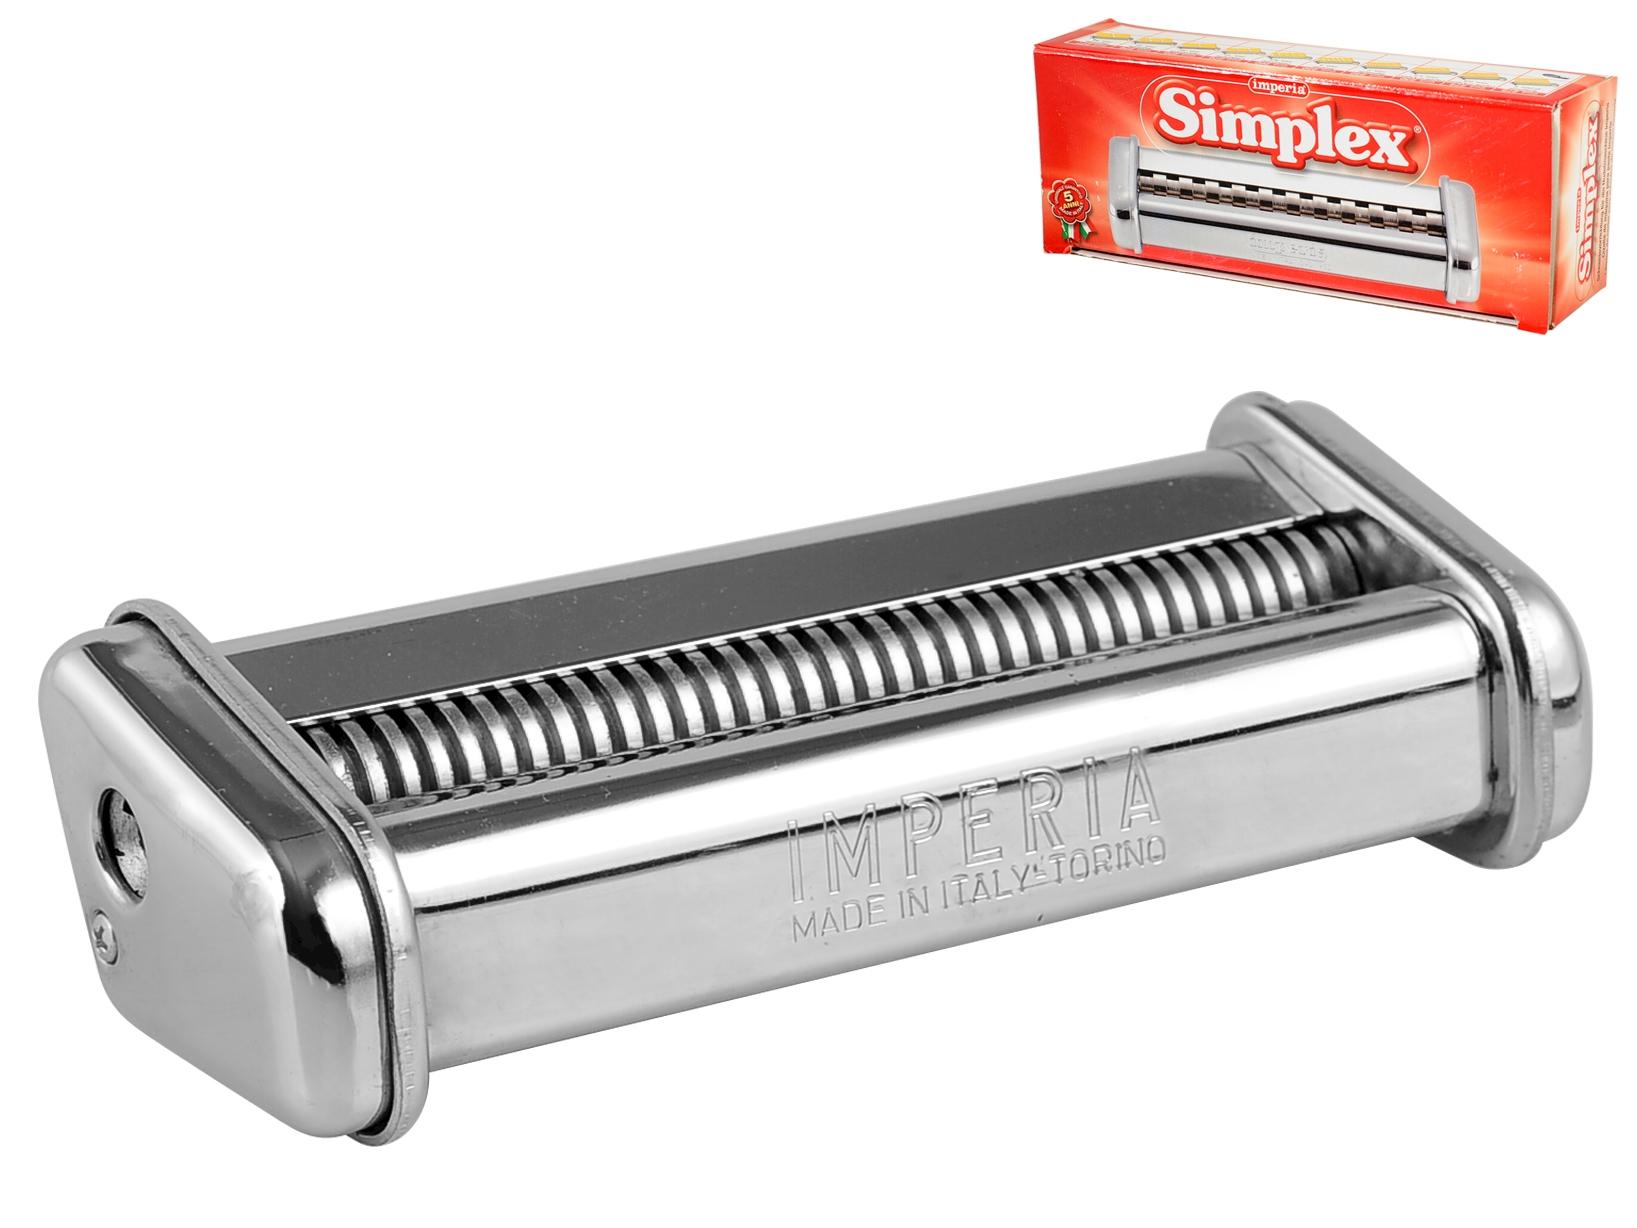 Accessorio Simplex Sp150 T2 Tagliat